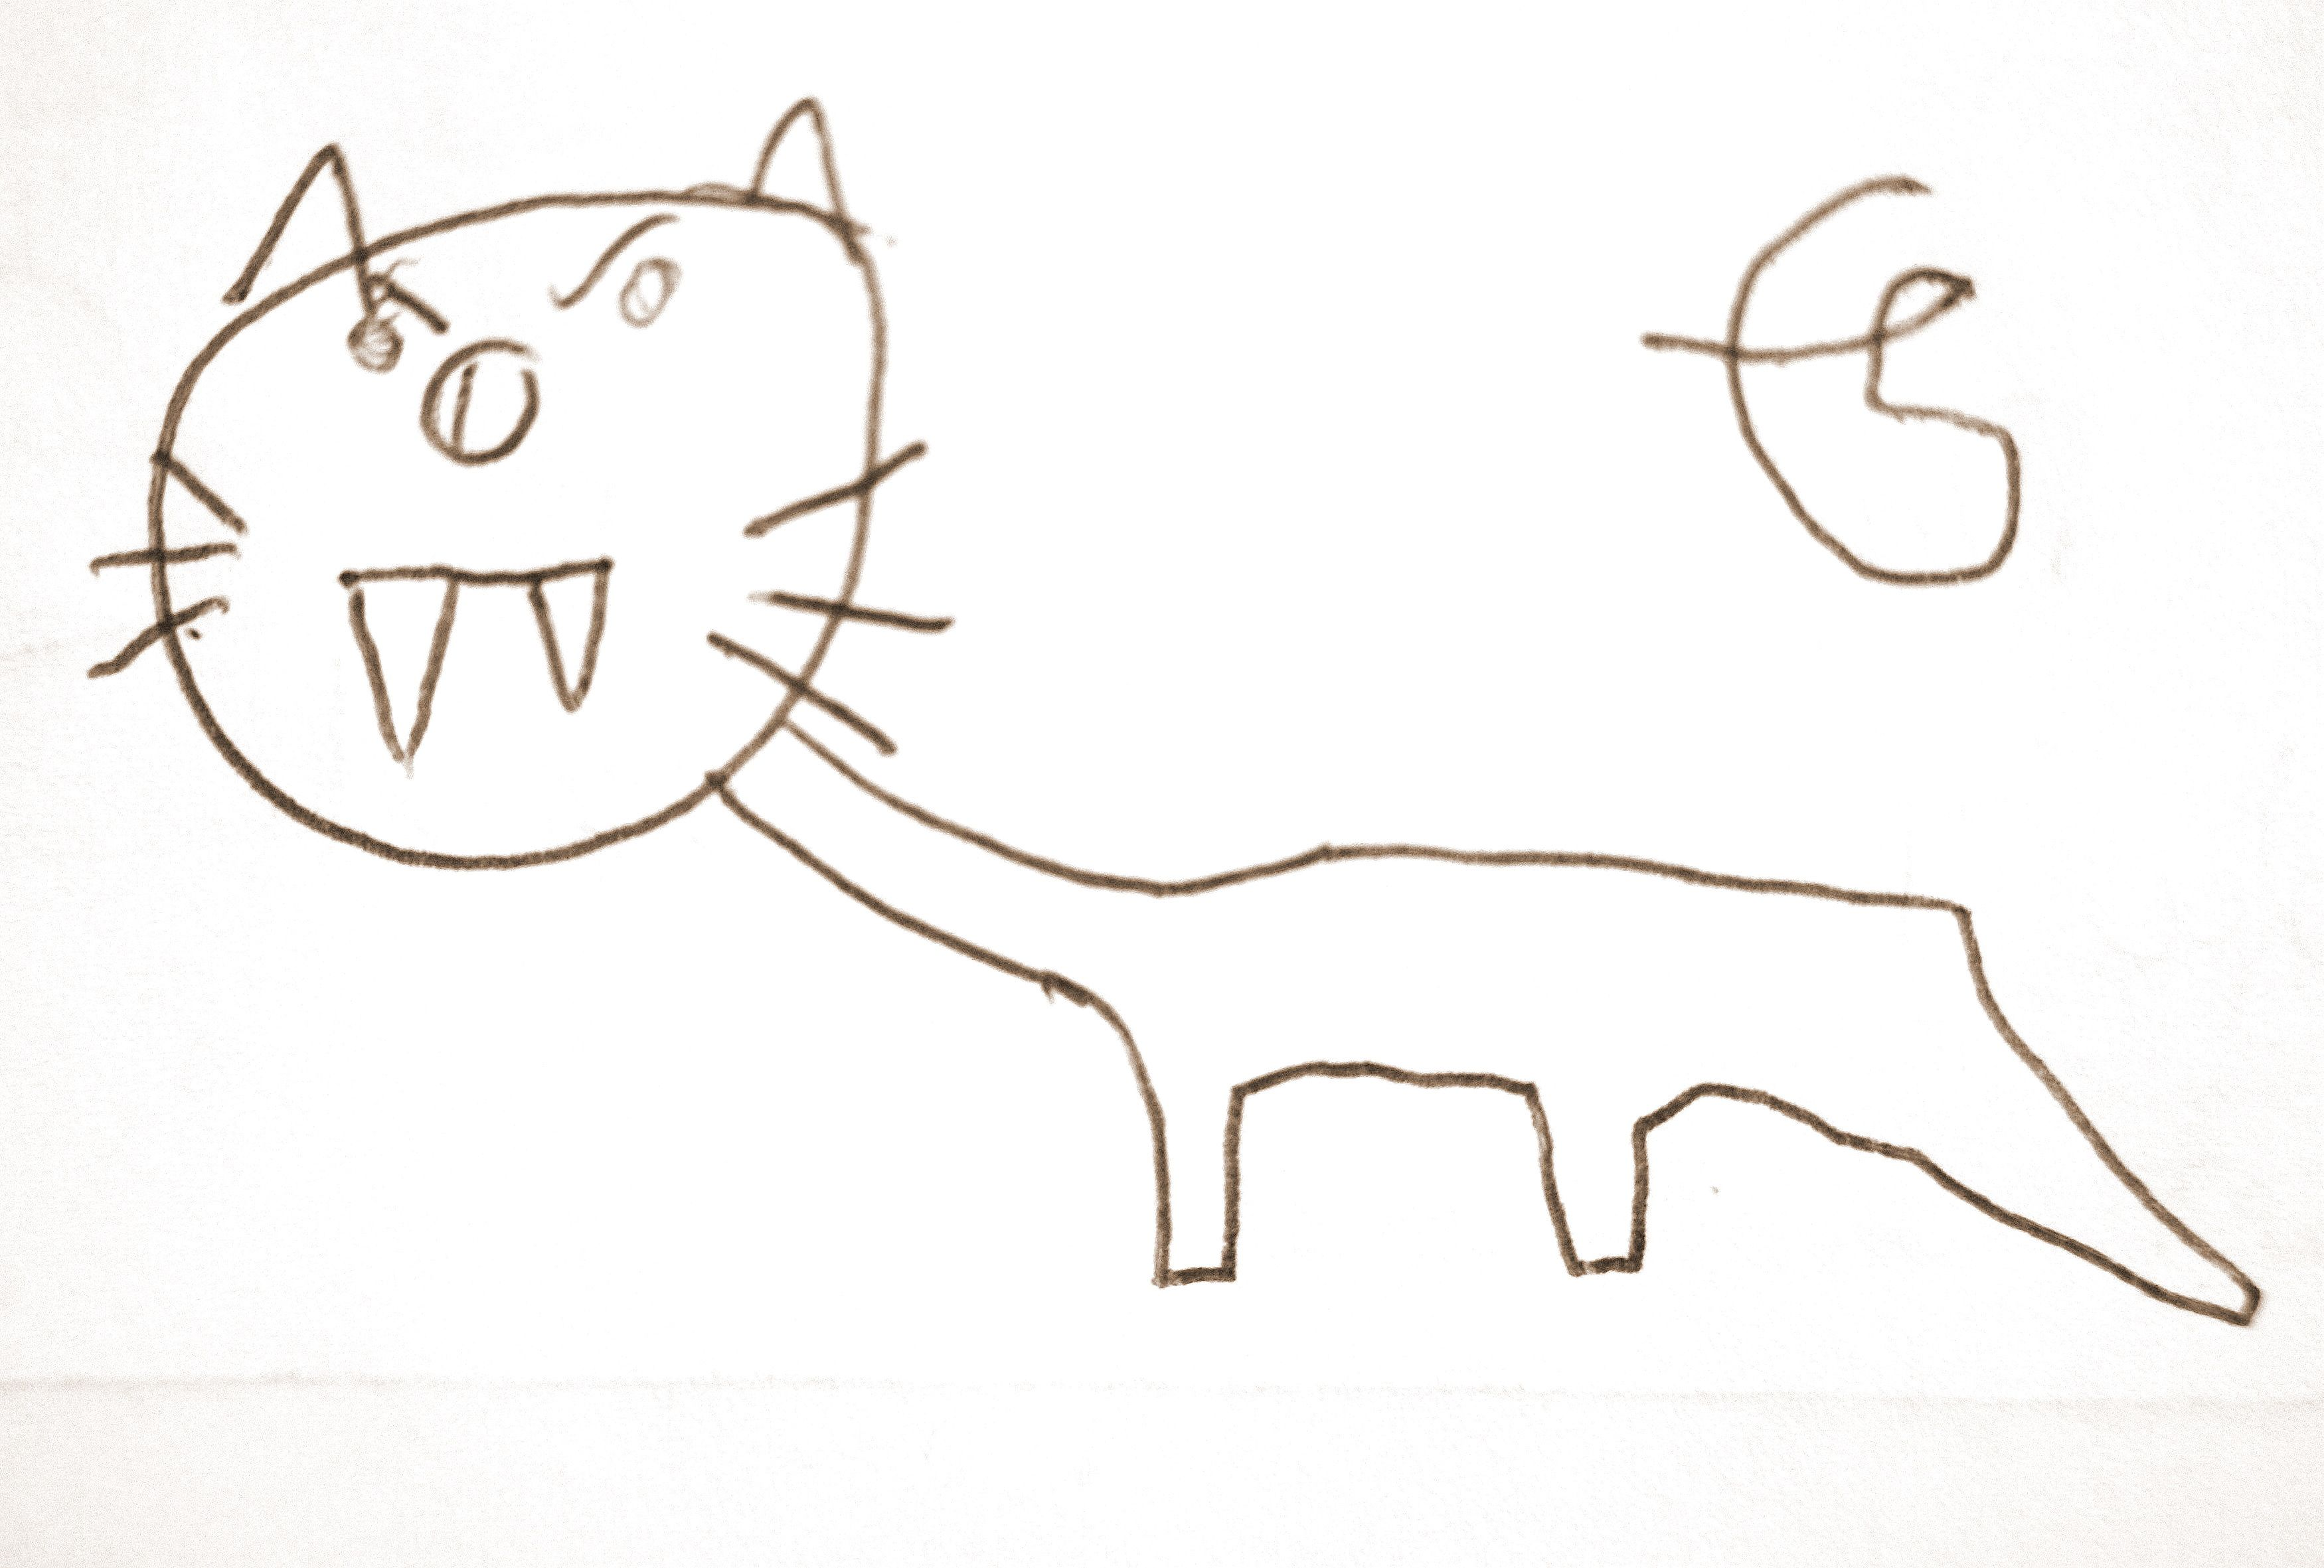 Le tigre aux dents de sabre tigre drawing dessins d 39 enfants children 39 s drawings dent de - Dessin de sabre ...